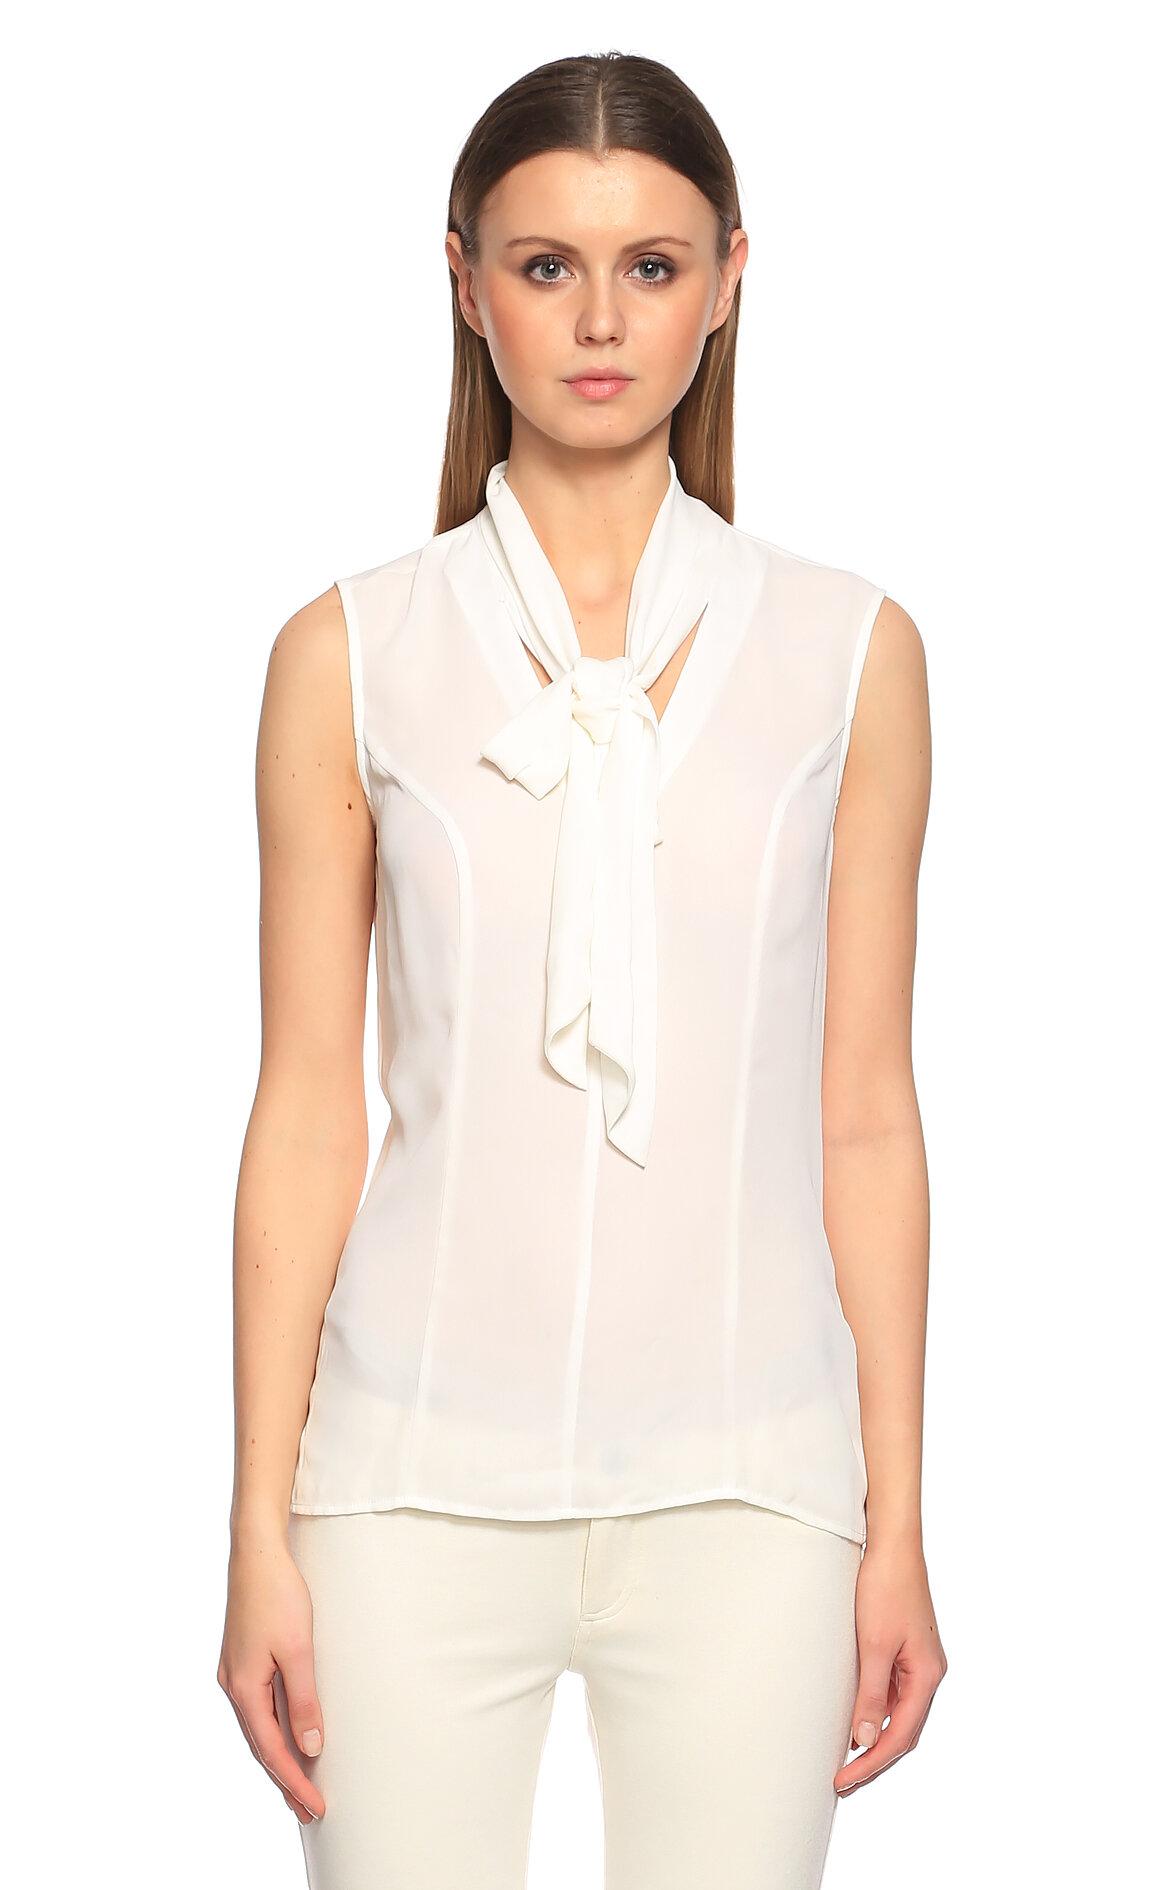 Guess-Guess Fular Yaka Beyaz Bluz